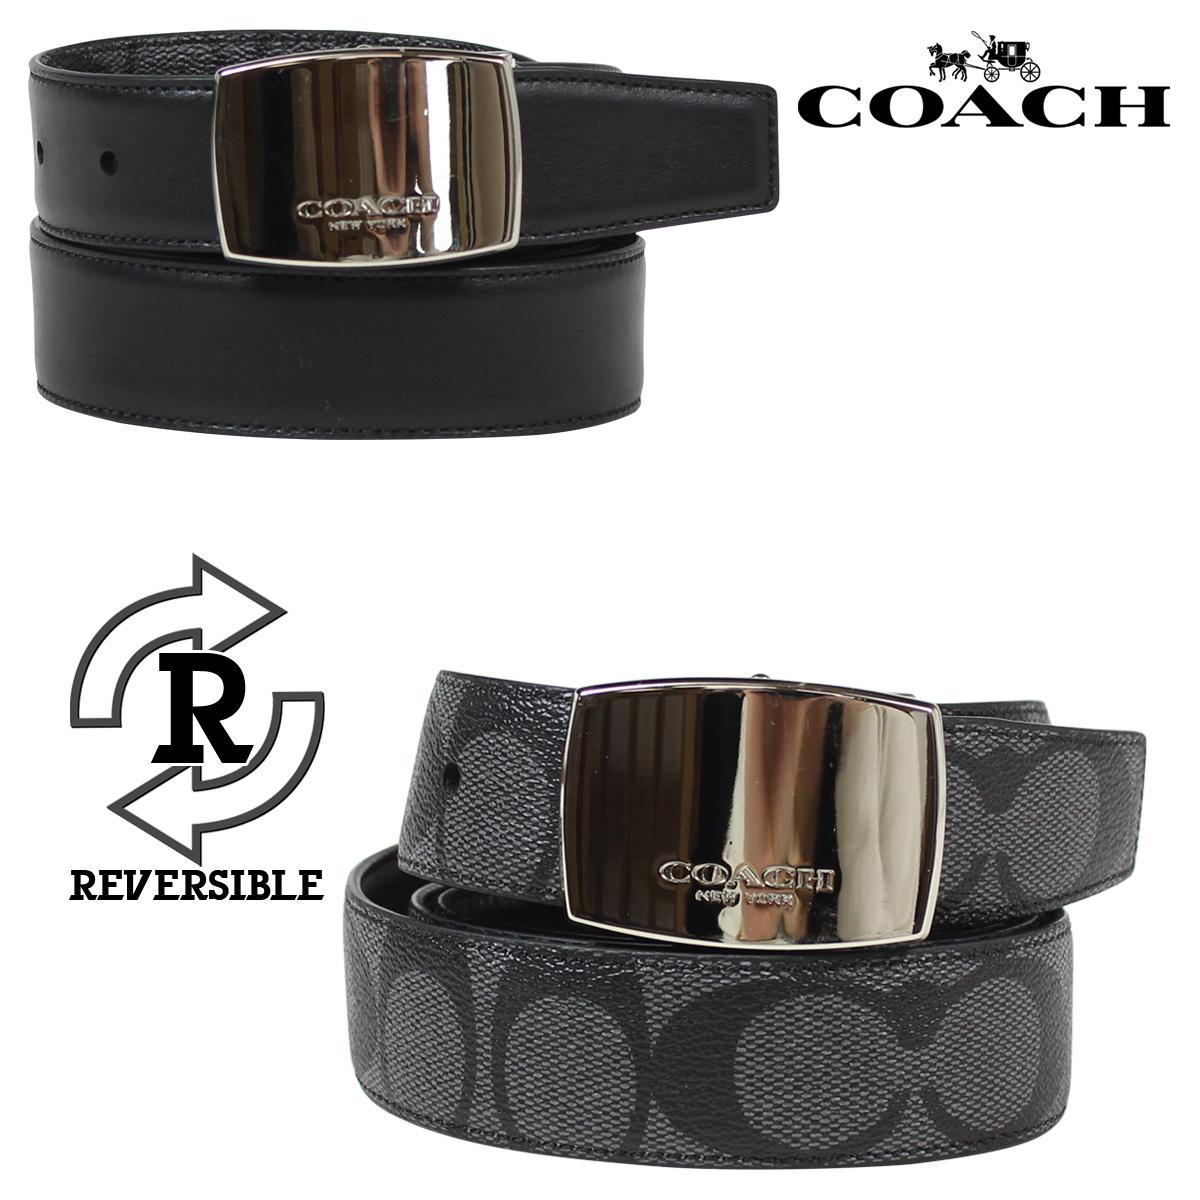 COACH コーチ メンズ ベルト レザーベルト リバーシブル 革 F64828 チャコール×ブラック [11/20 再入荷]